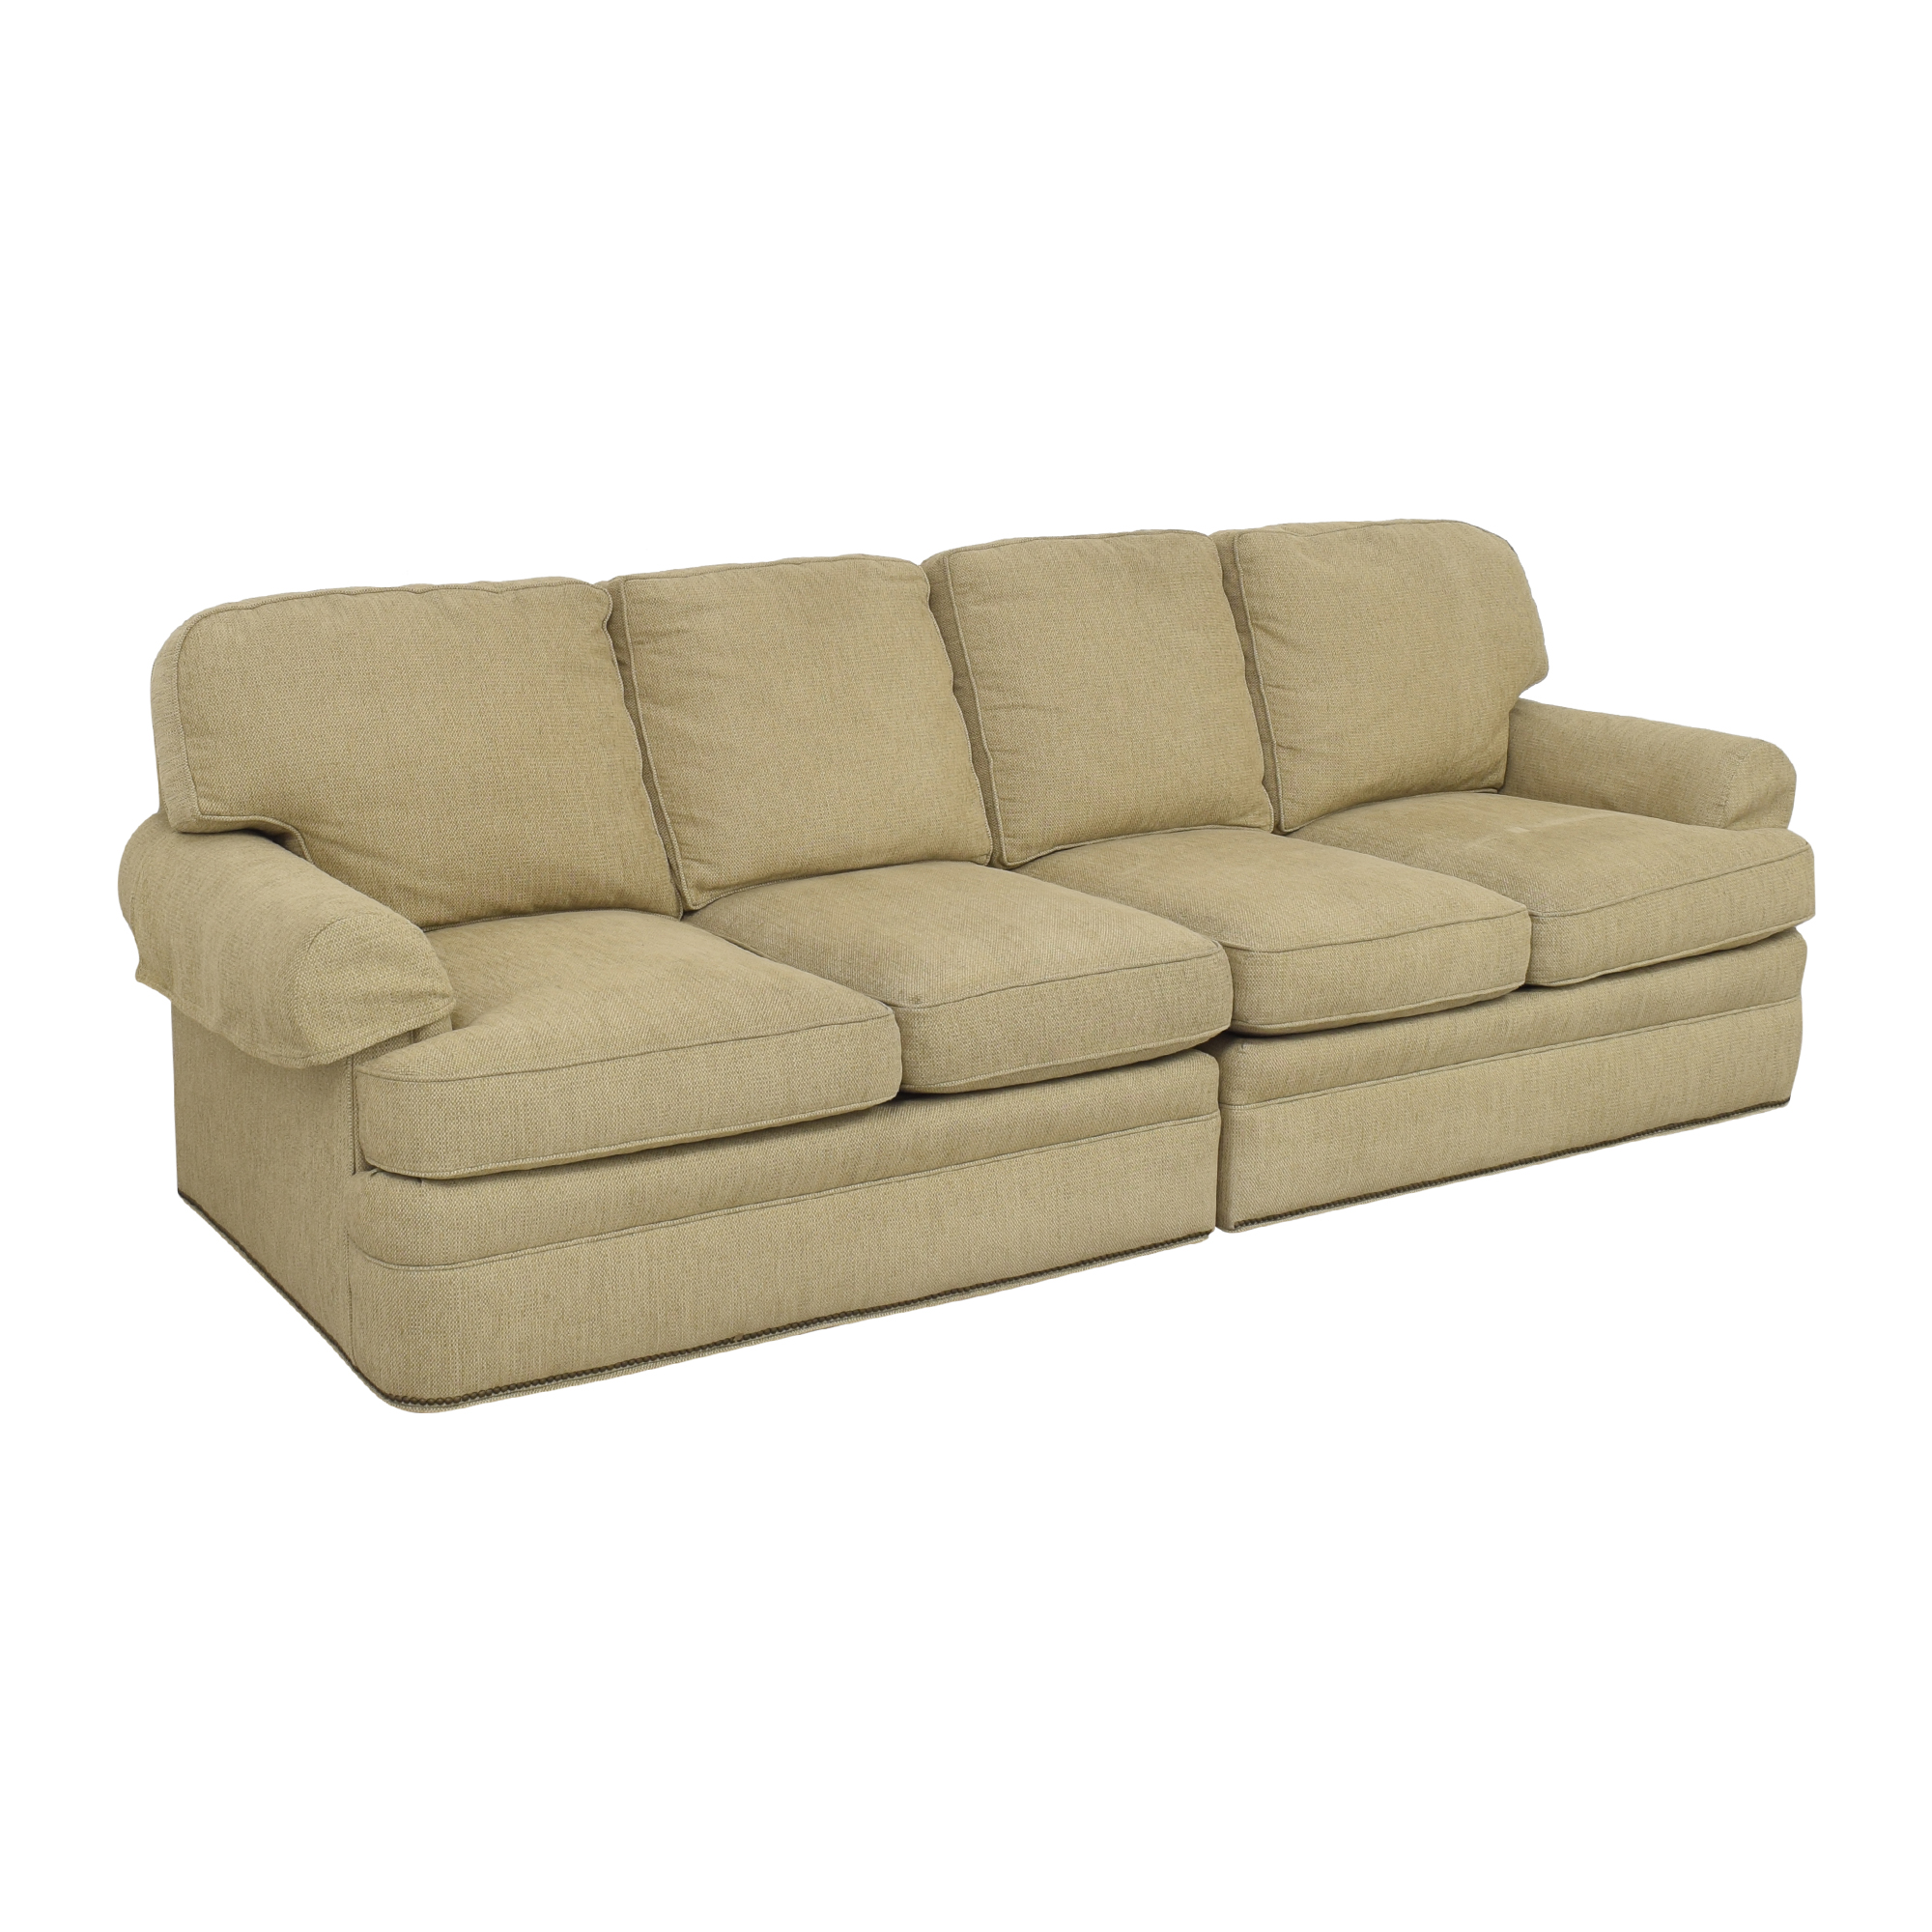 shop Safavieh Safavieh Two Piece Sectional Sofa online